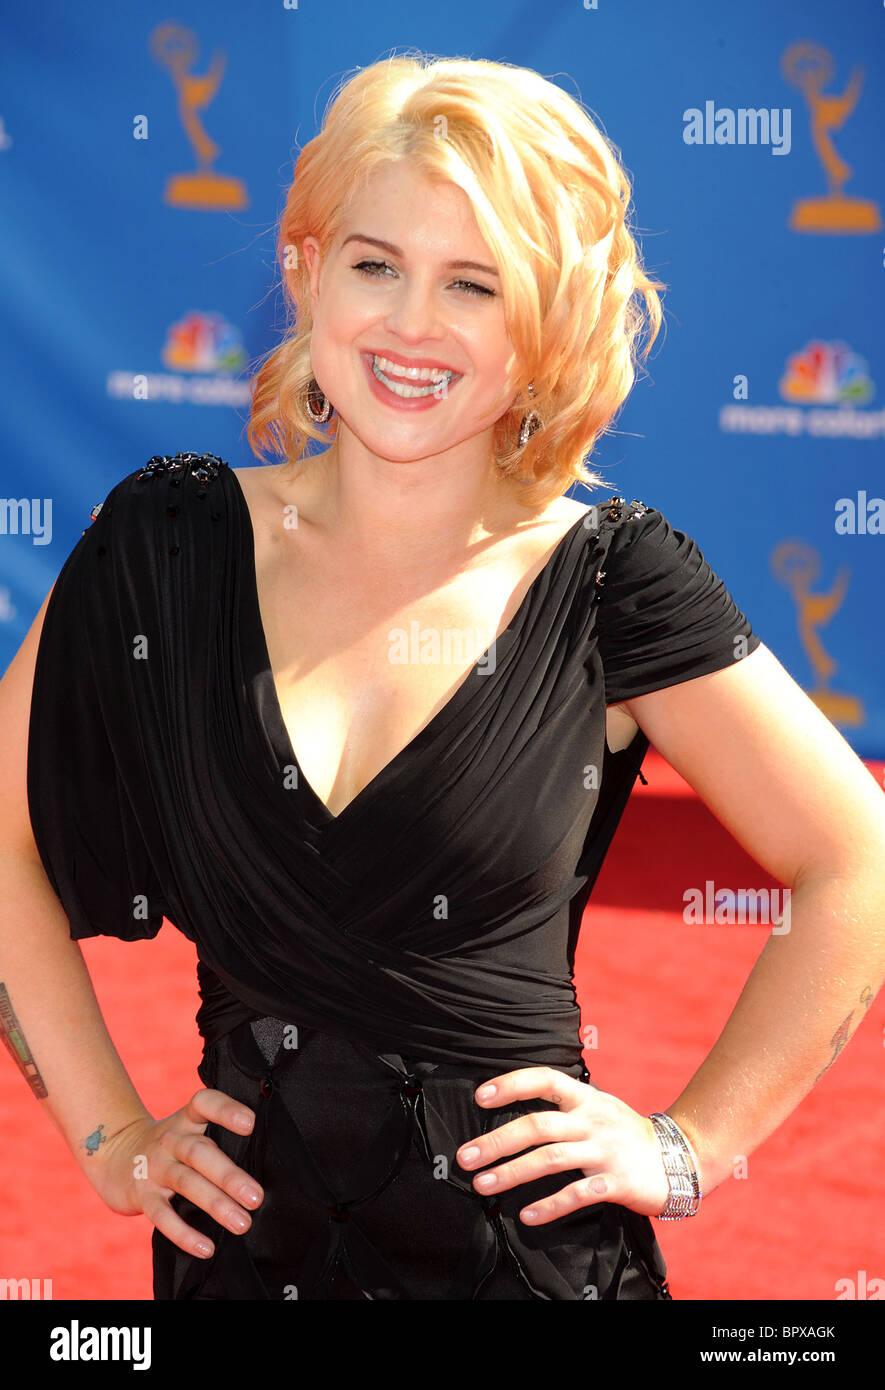 KELLY OSBOURNE at  62nd Annual Primetime Emmy Awards at Nokia LA Live August 29, 2010 in LA. Photo Jeffrey Mayer - Stock Image